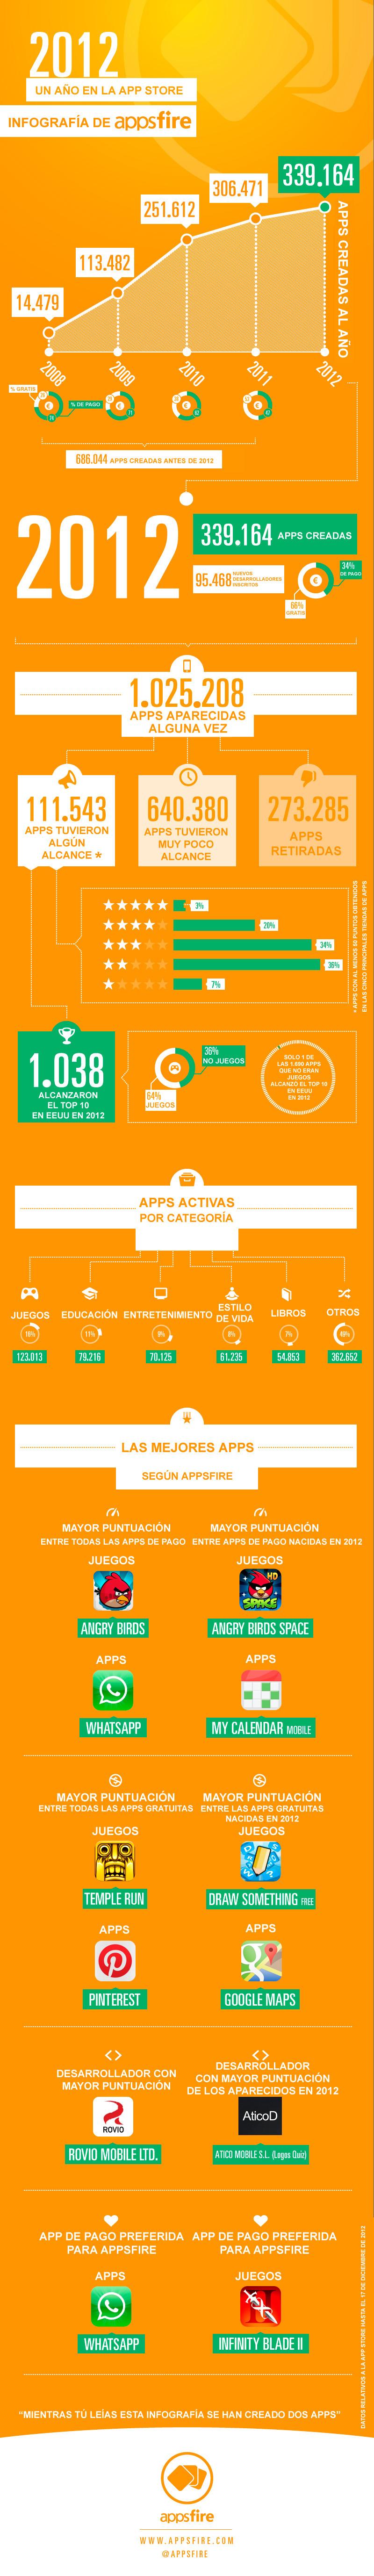 infografia-2012-app-store